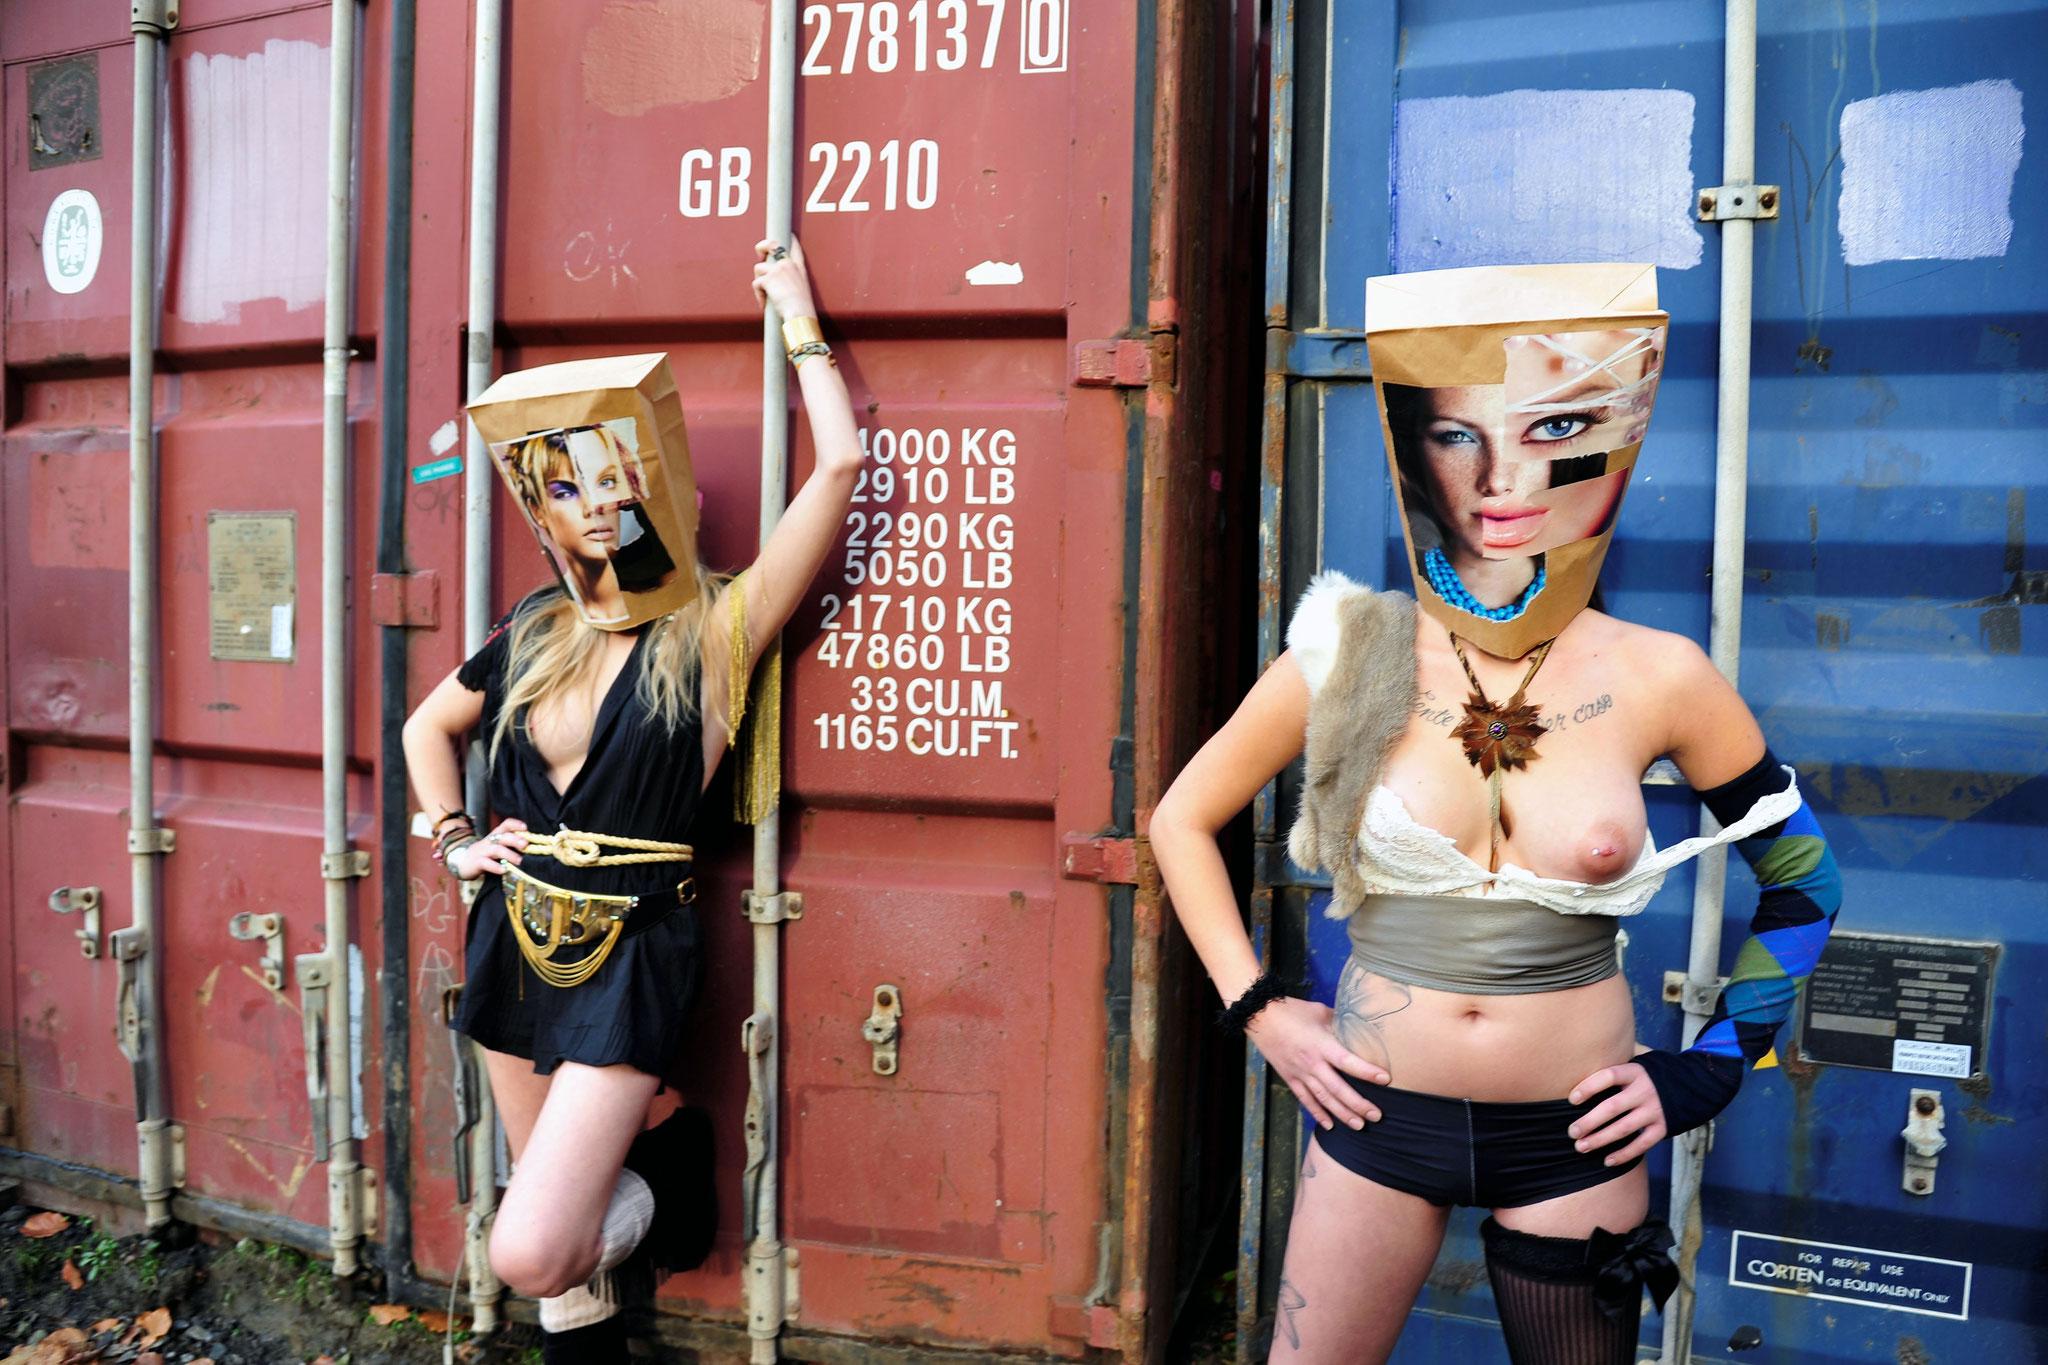 Foto & Konzept: Andreas Ender, photo-art+painting